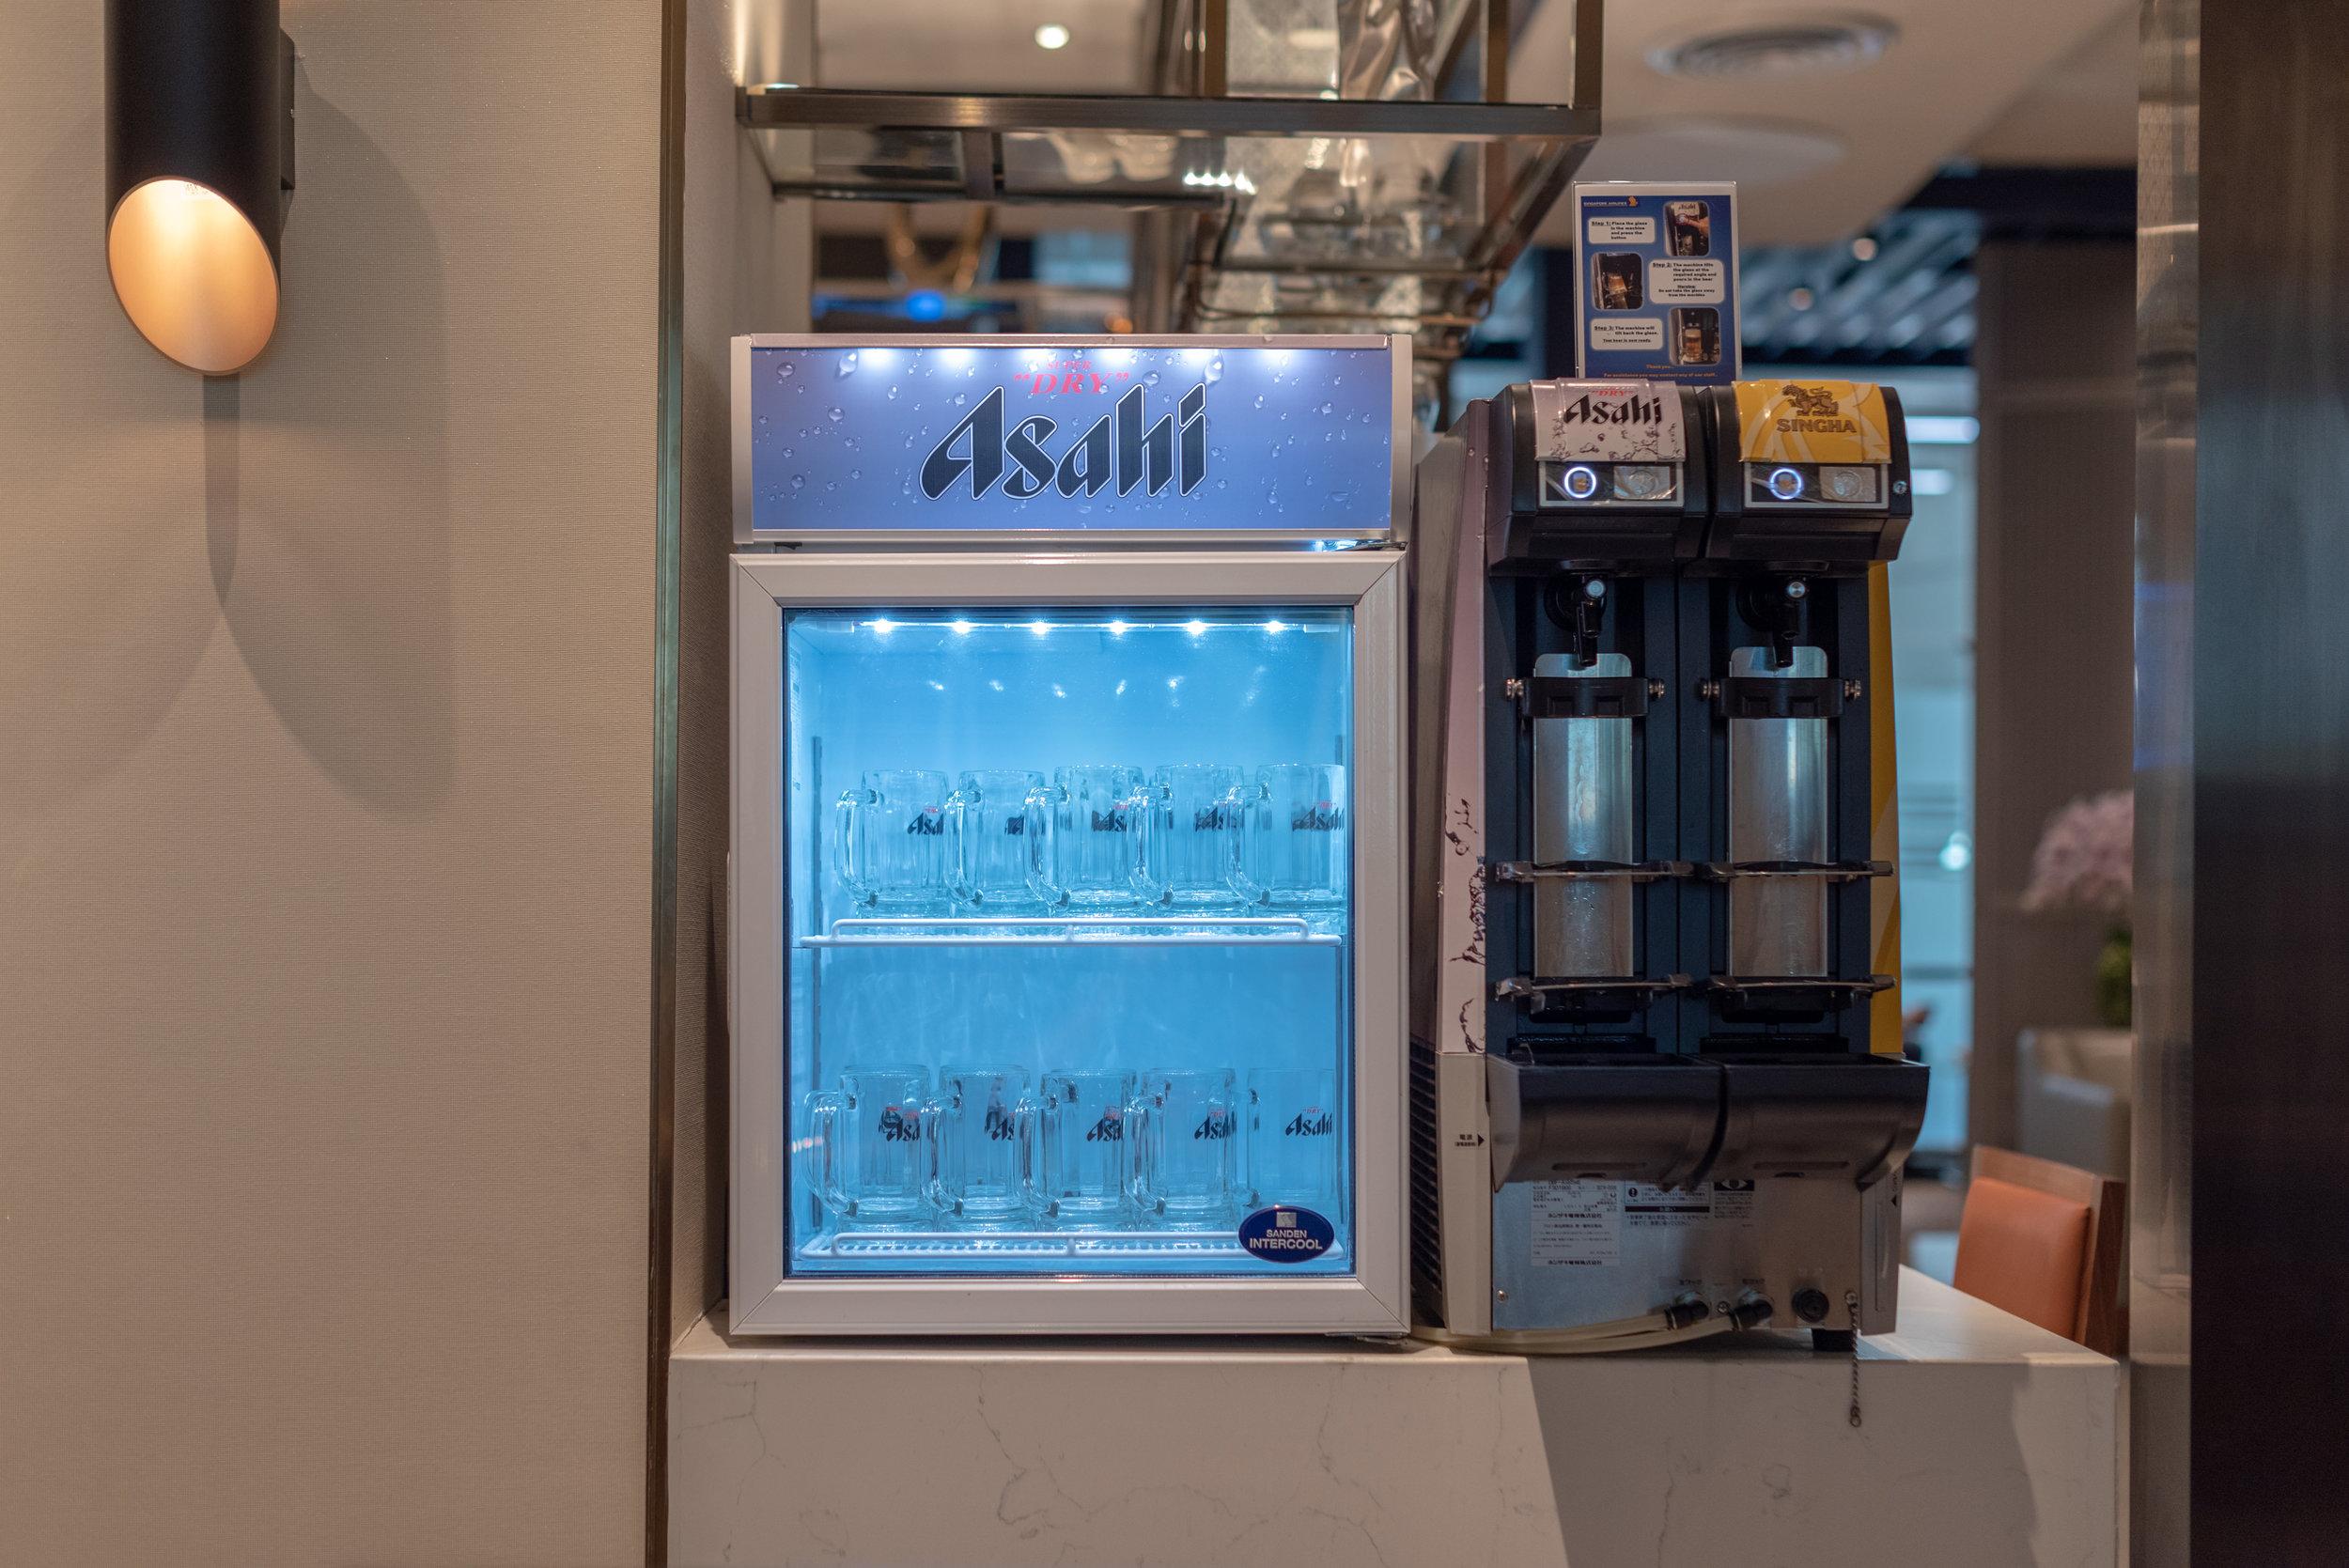 Self-service Beer Tap  Singapore Airlines SilverKris Lounge - Suvarnabhumi Airport (BKK)